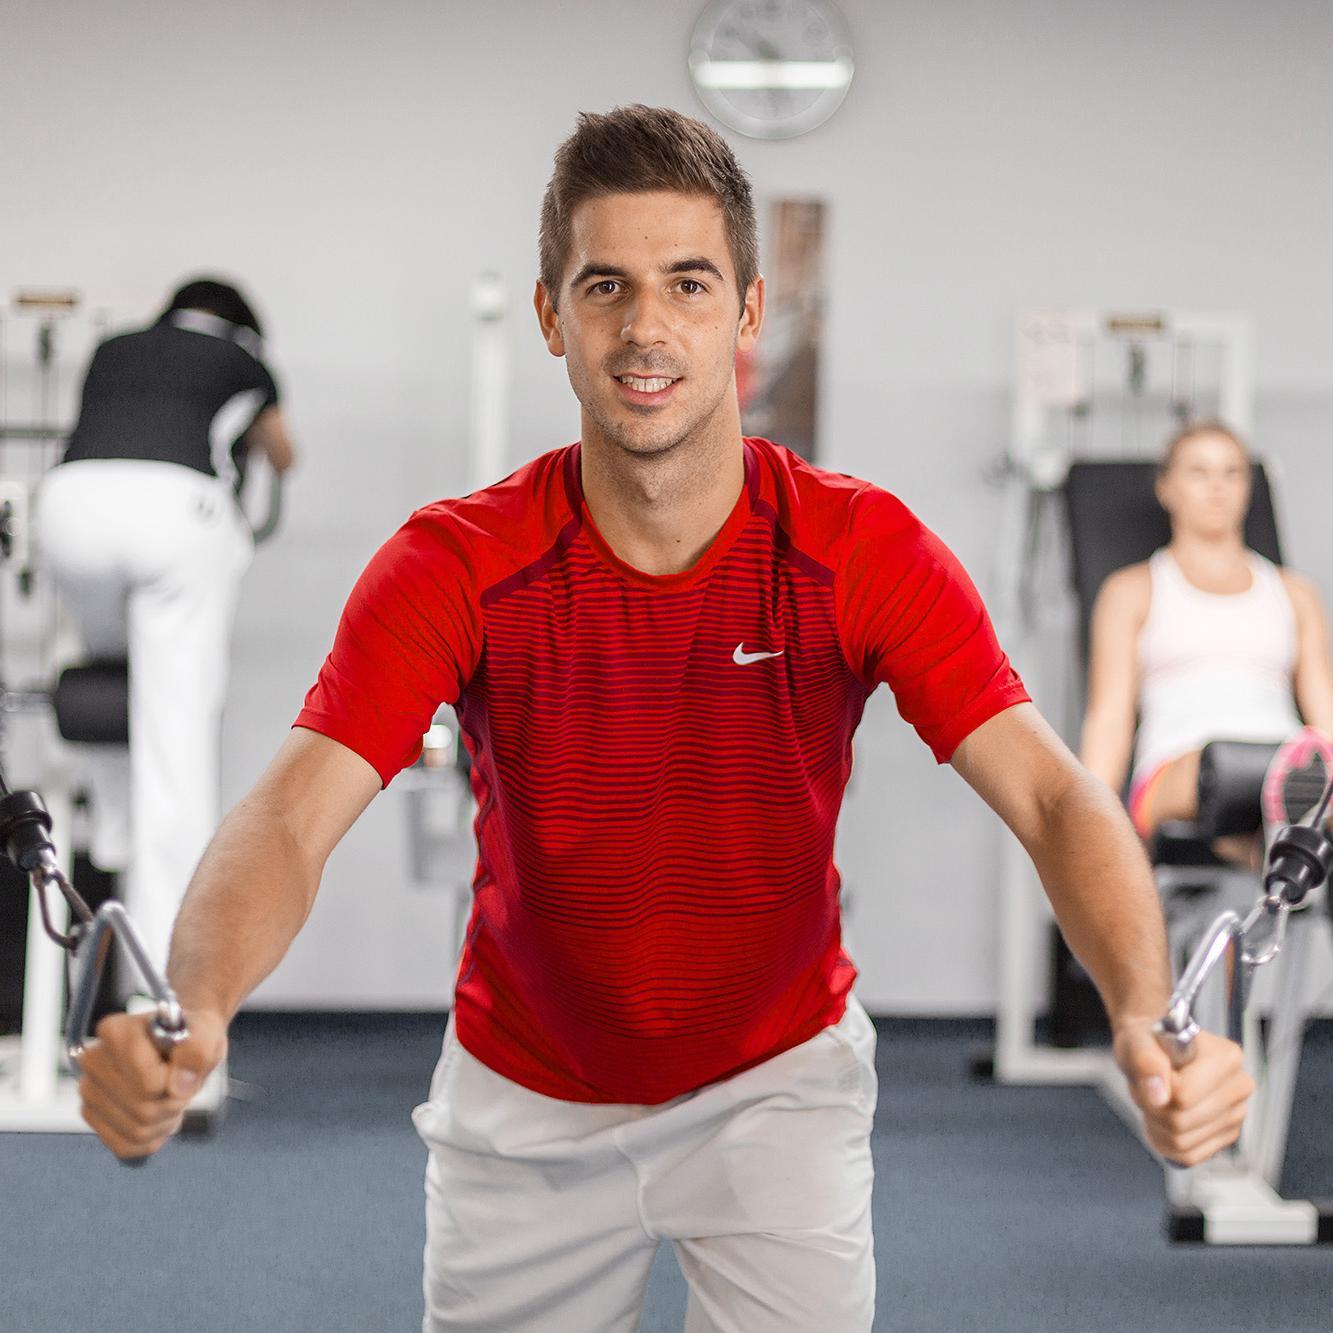 Multifunktional Fitnessgerät